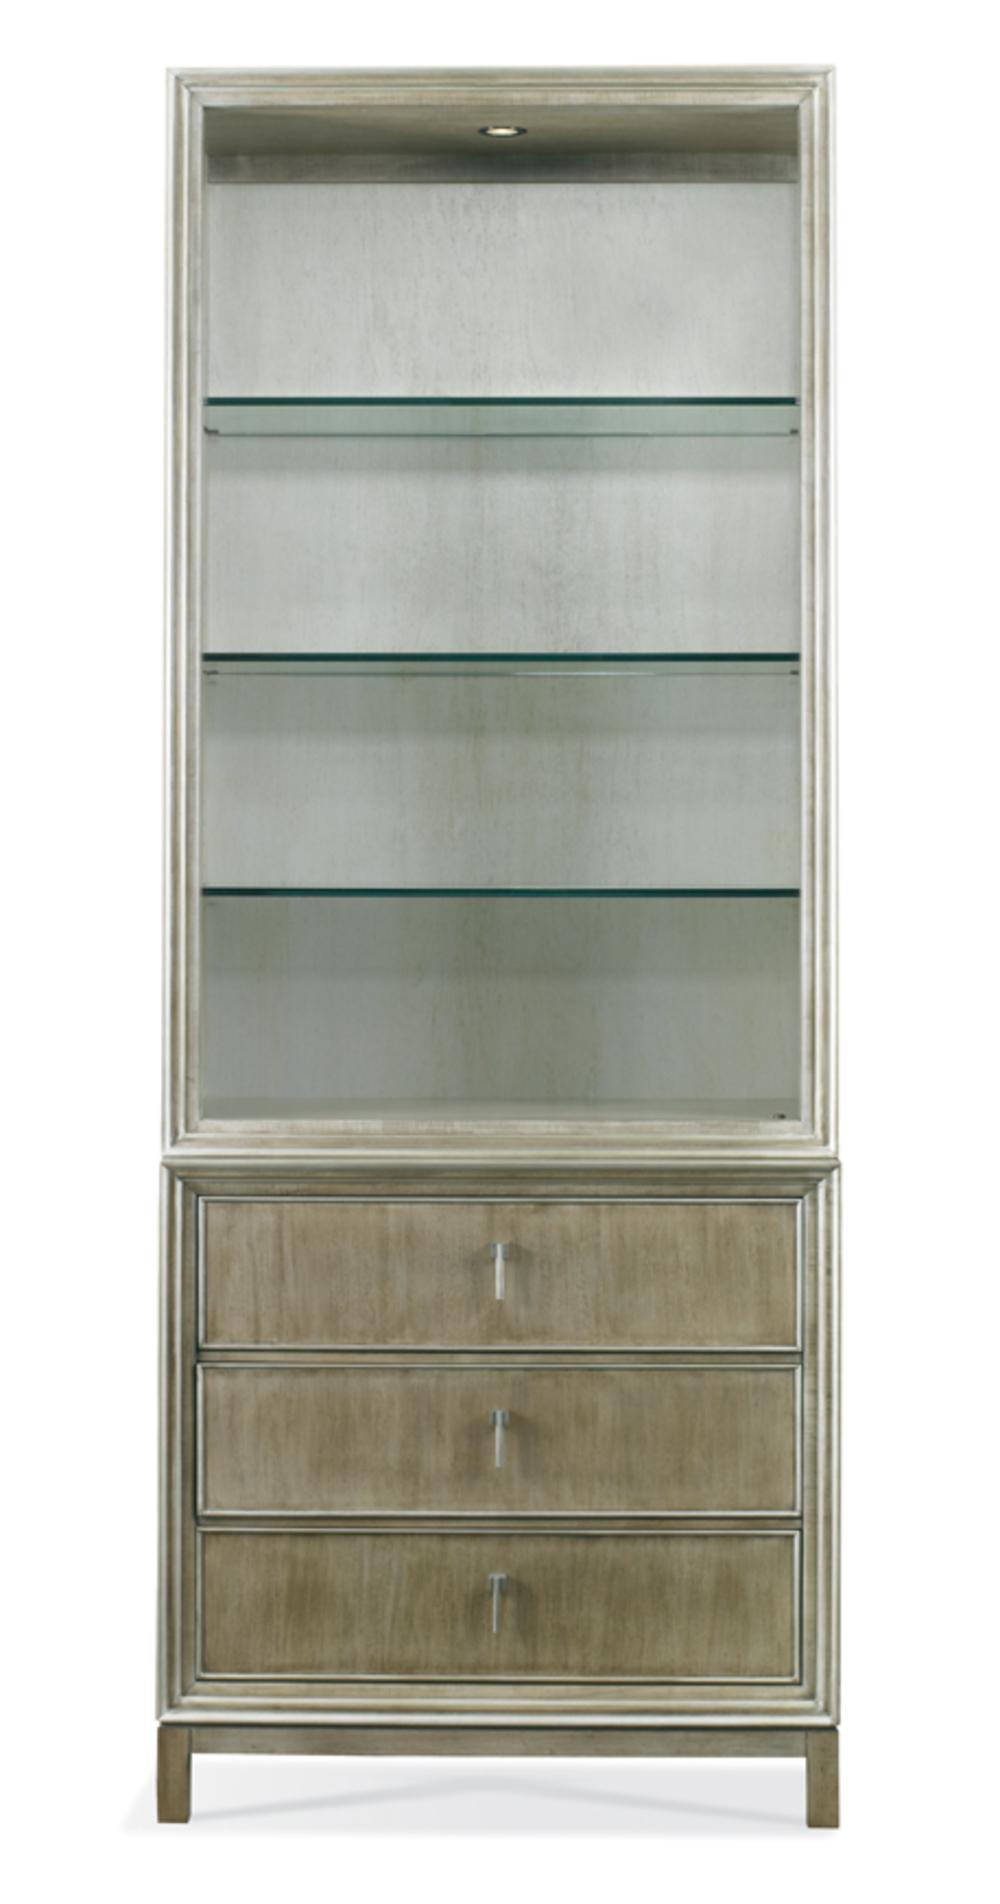 Hickory White - Carl Bookcase w/ Glass Shelves